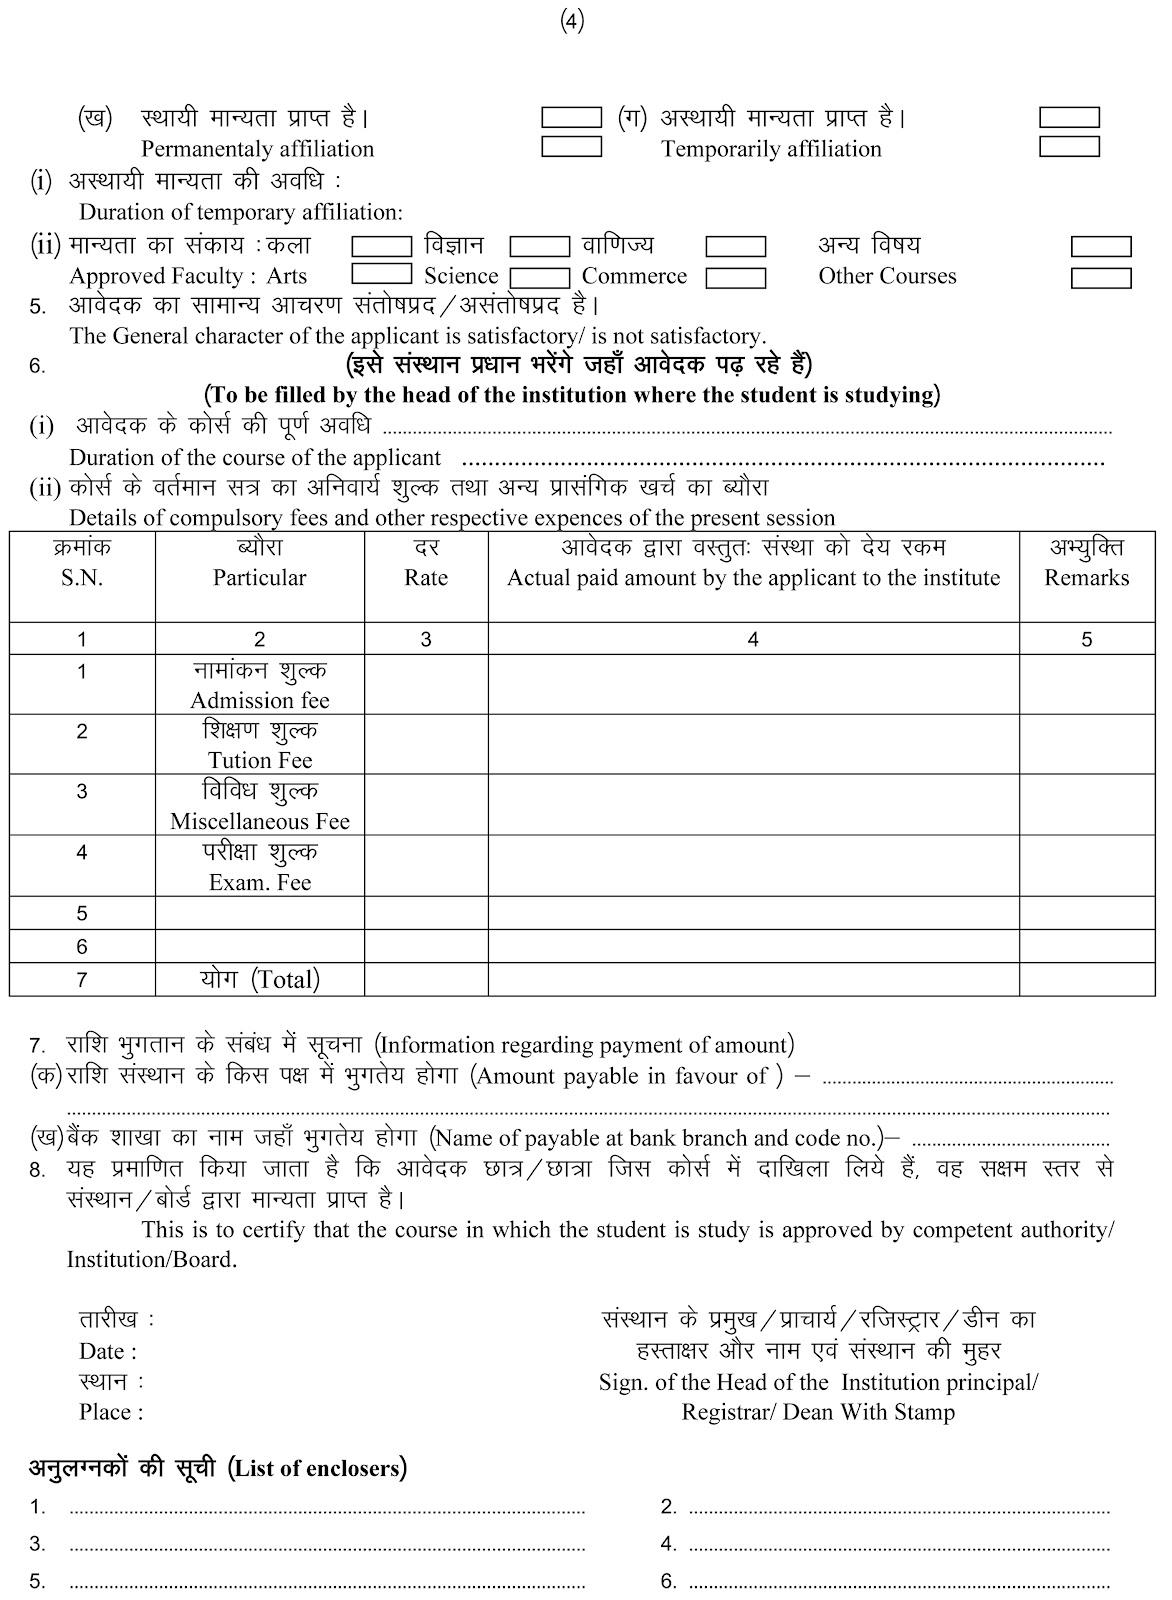 Application letter bonafide certificate college order custom application letter for for bonafide certificate classification essay outline example yelopaper Gallery